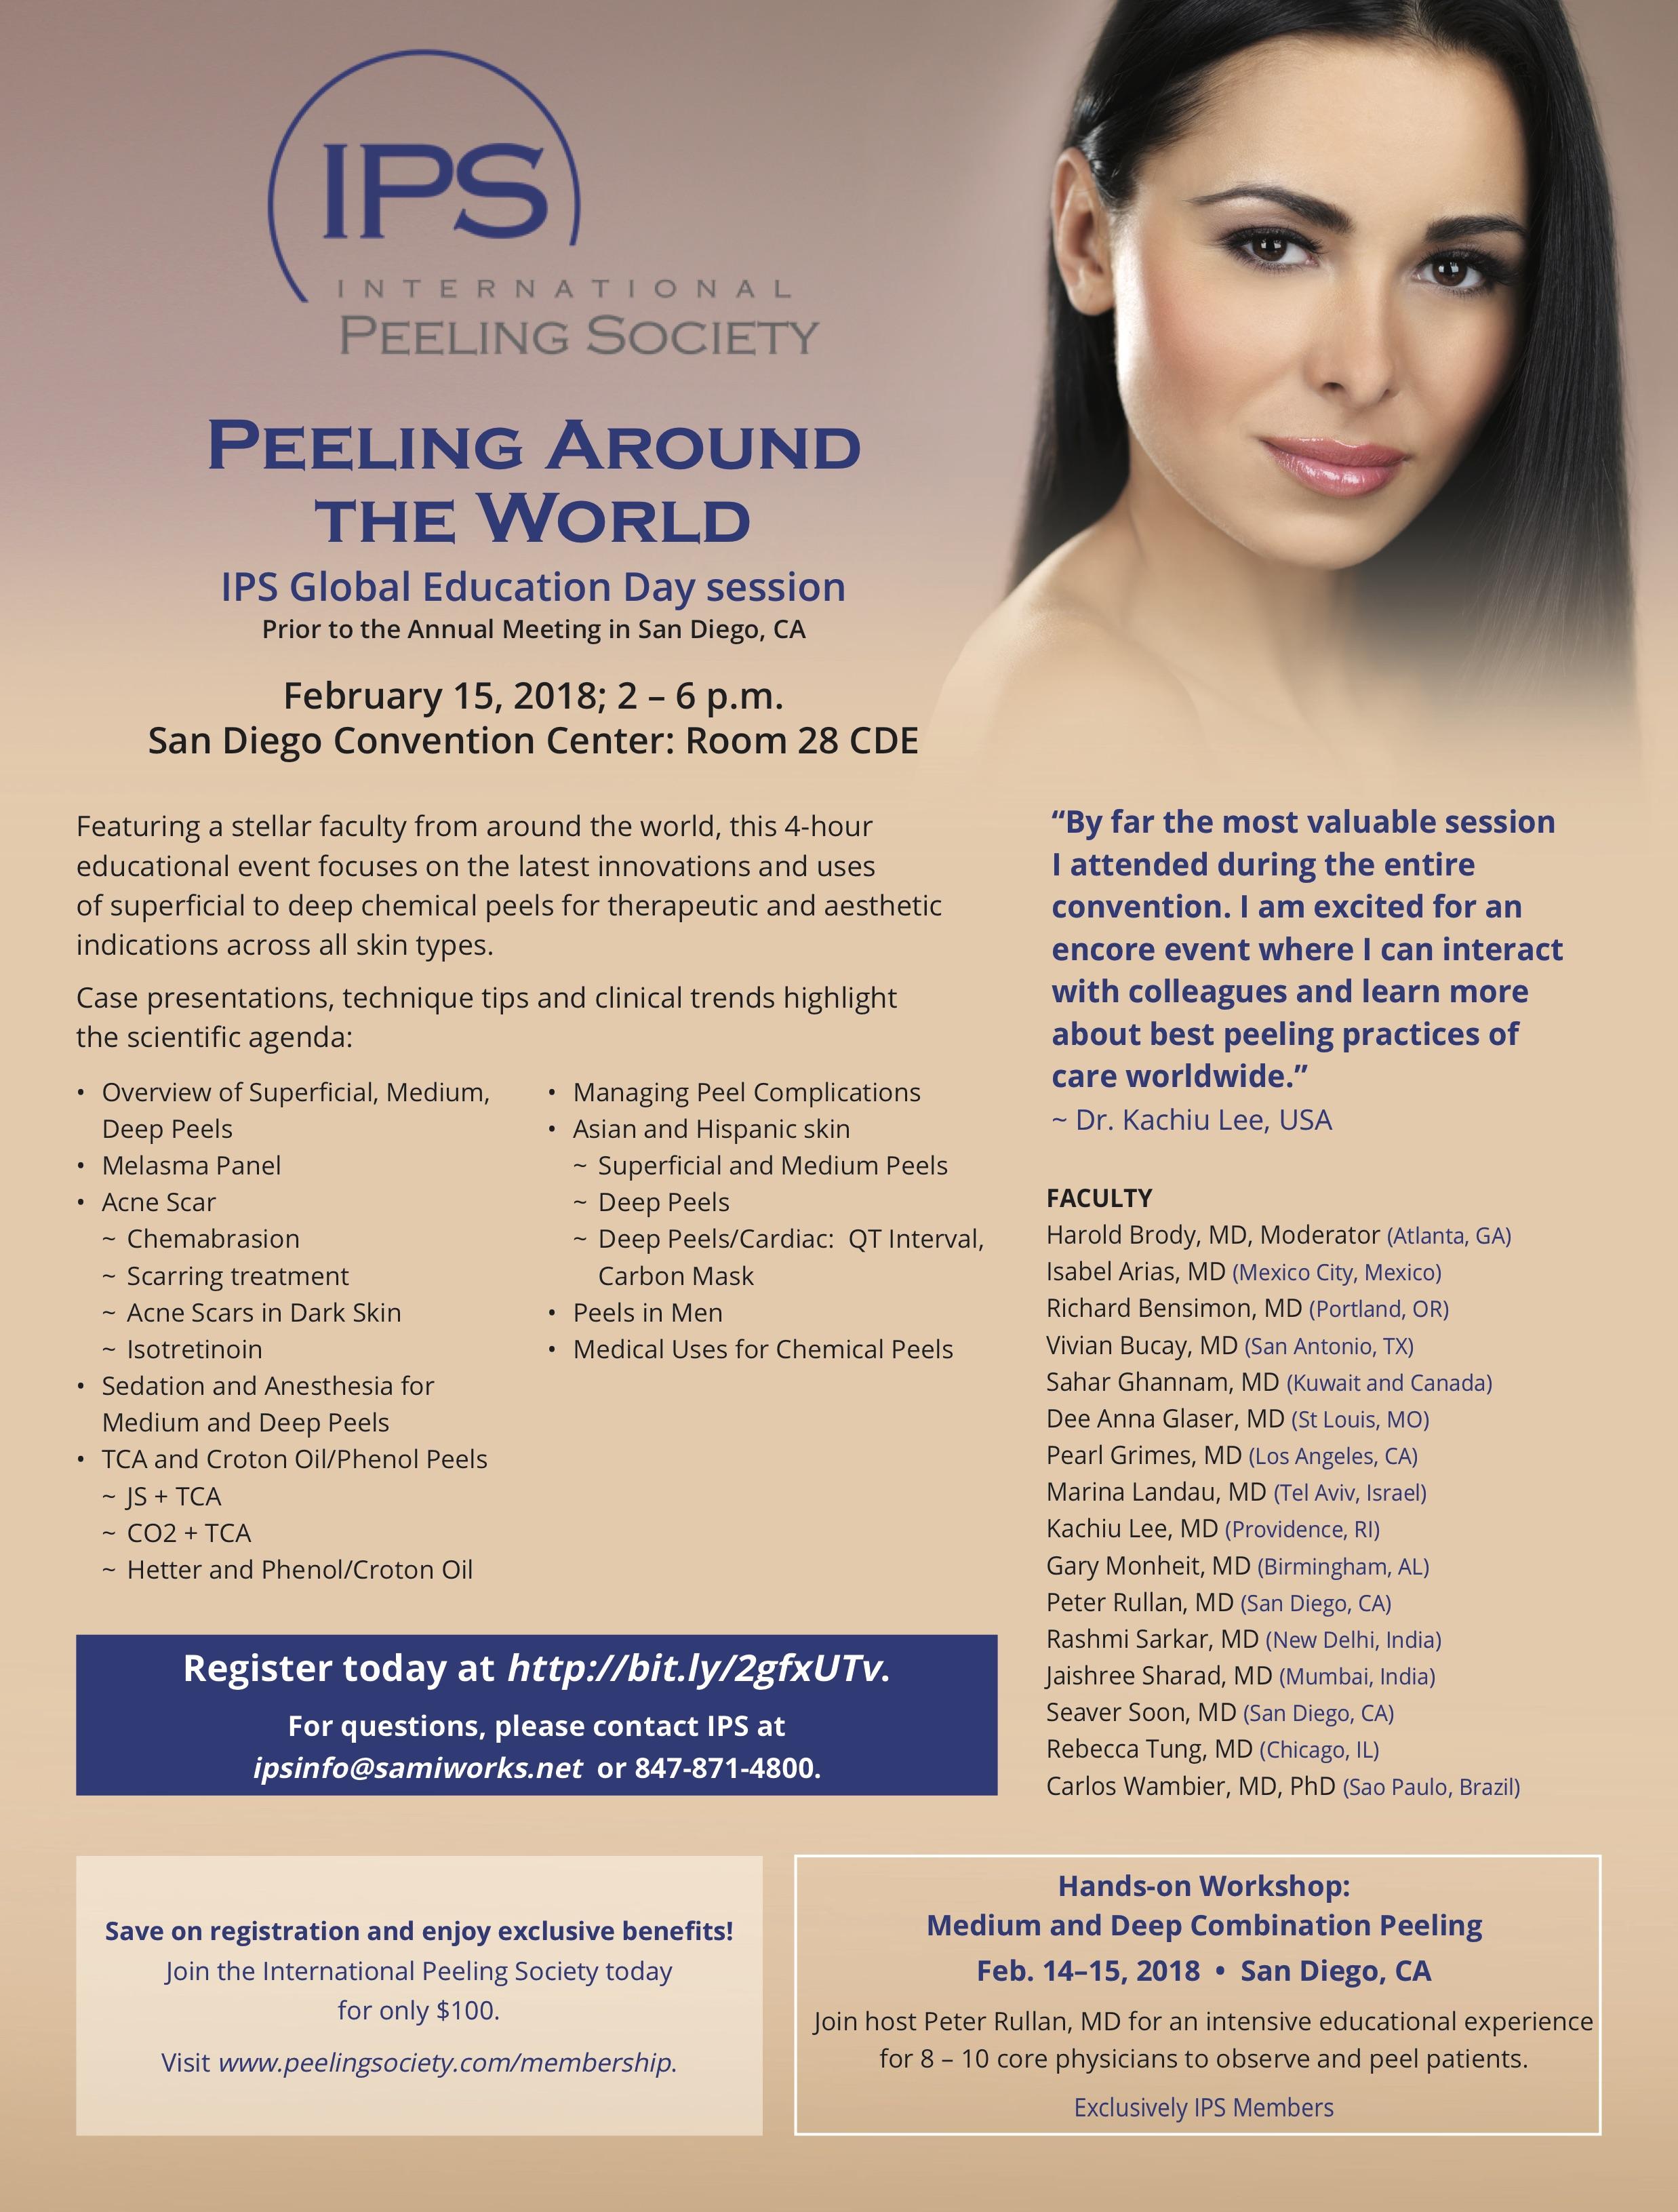 Flyer_Peeling_Around_the_World18.jpg